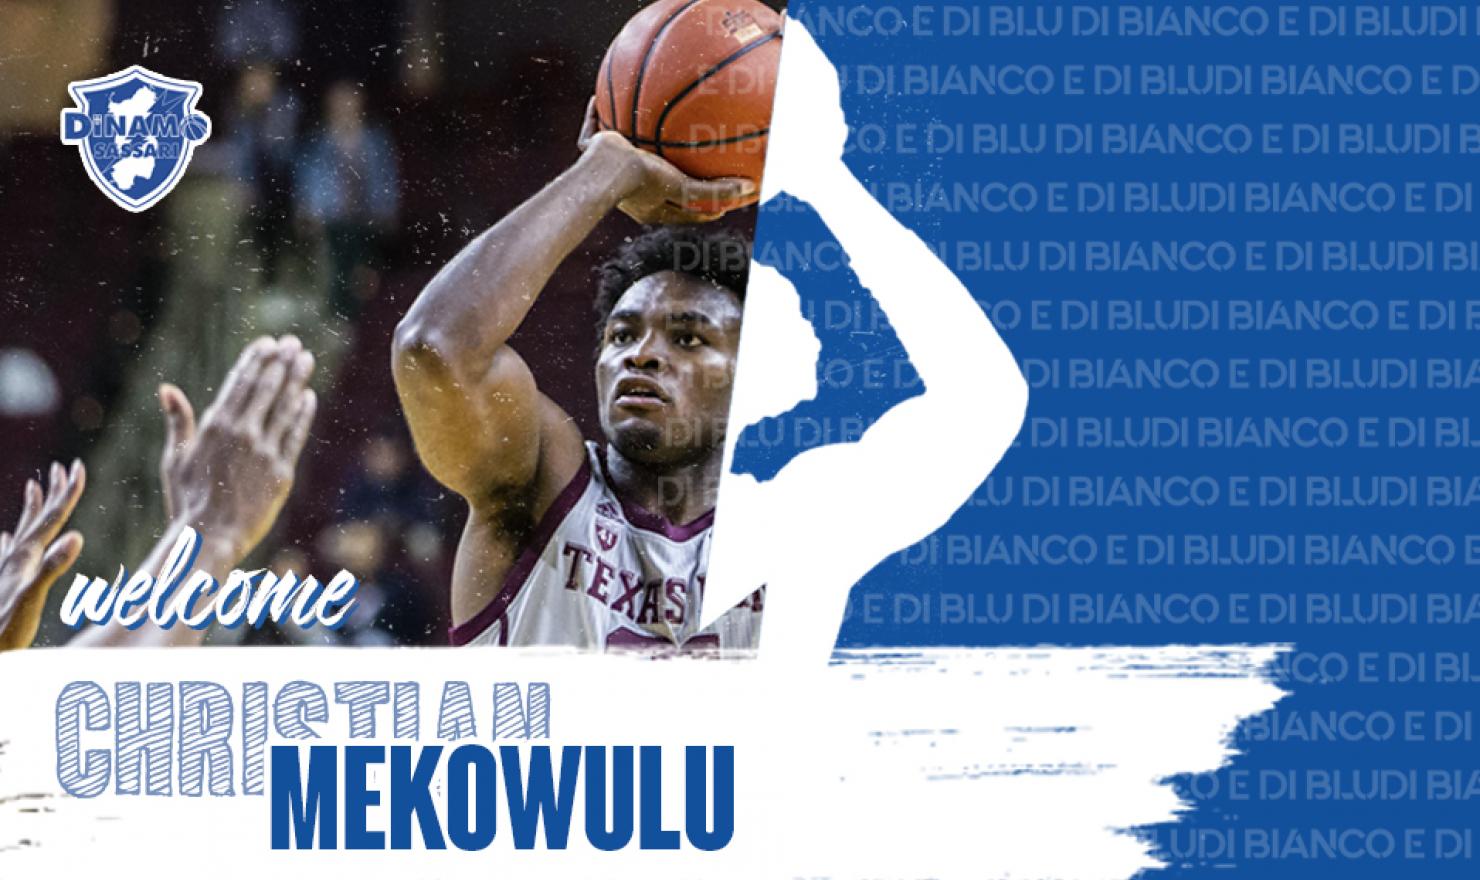 Sassari, il nuovo centro è Christian Mekowulu